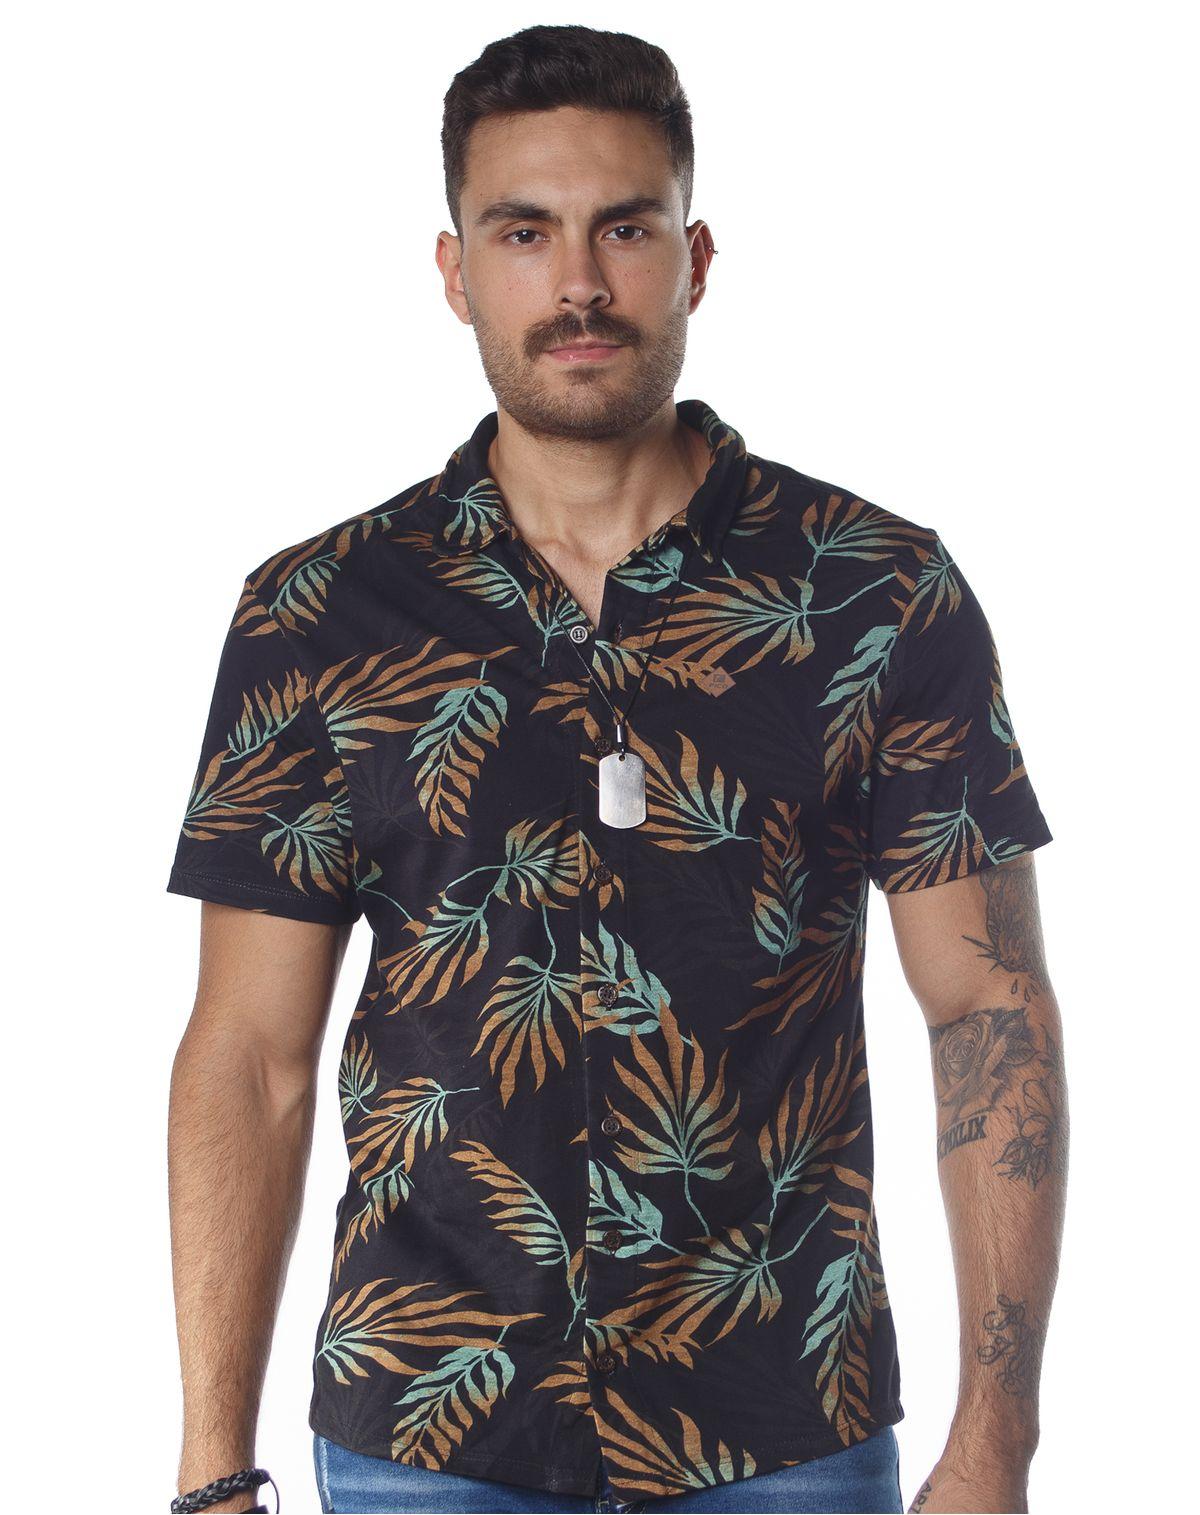 573440002-camisa-masculina-estampa-folhagem-preto-m-dd1